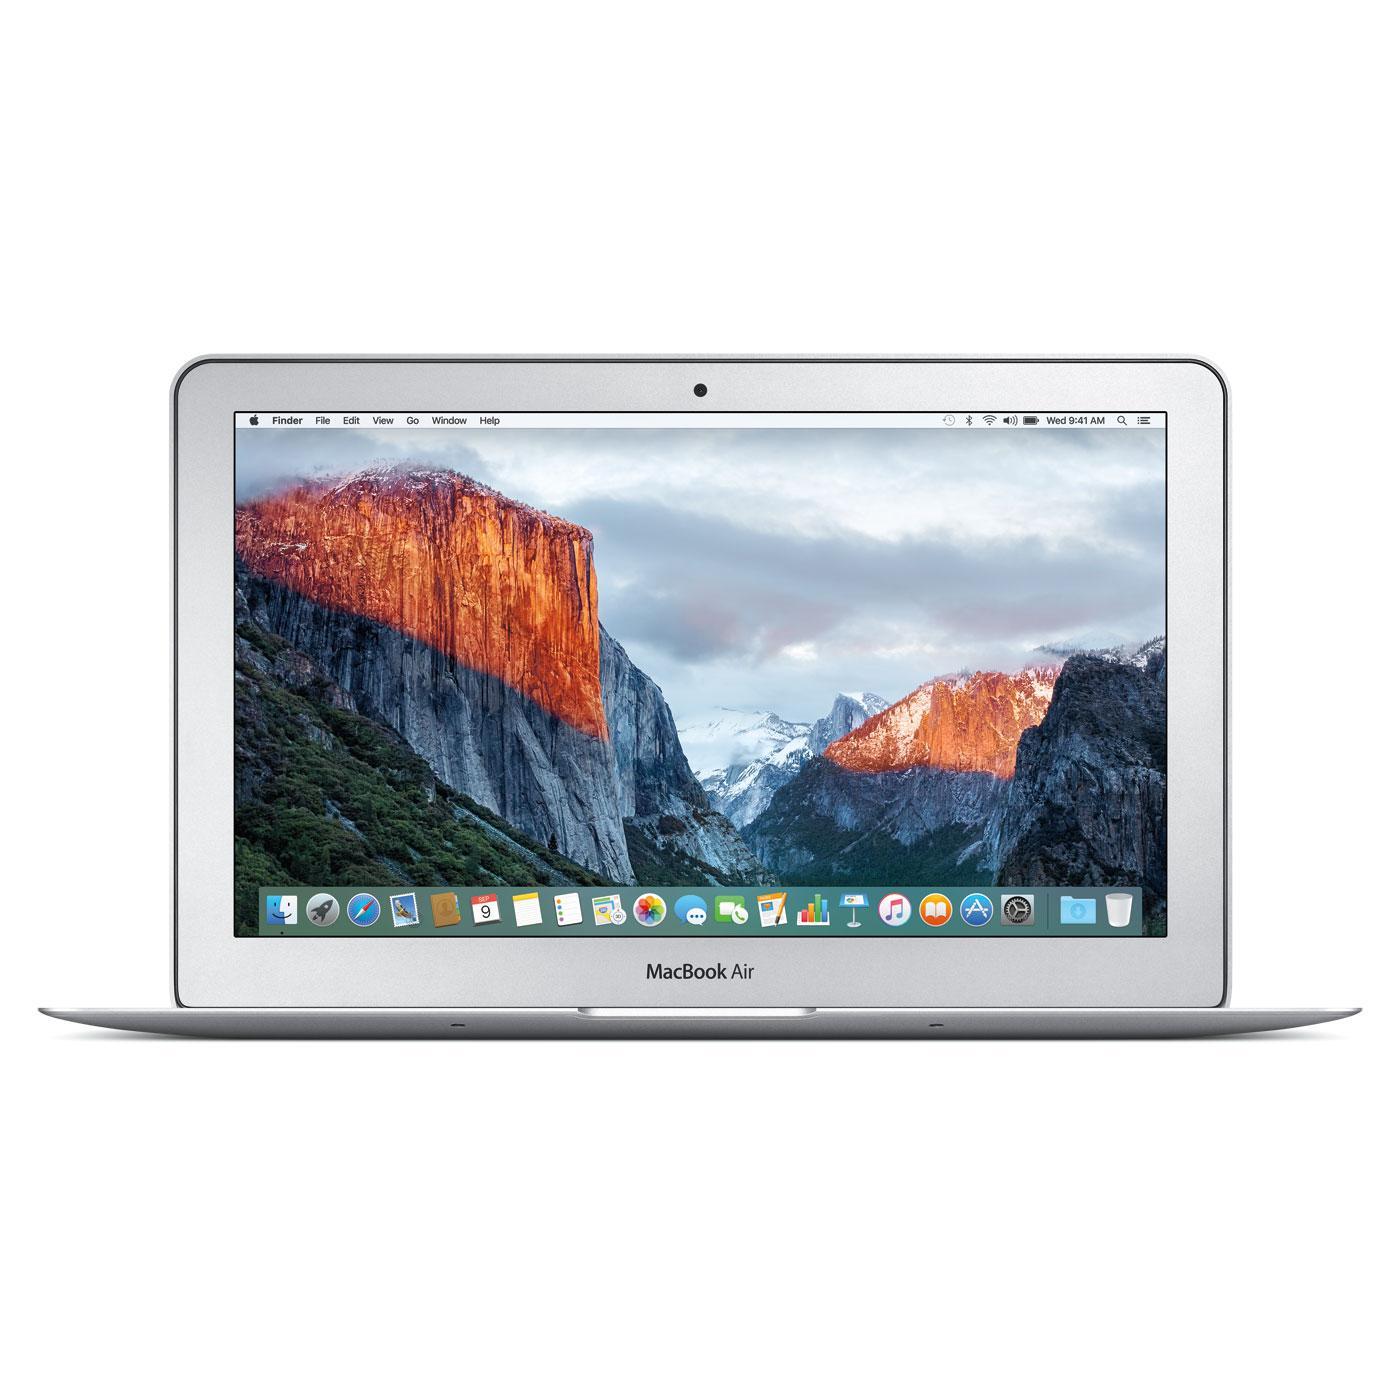 "PC Portable 13.3"" Apple MacBook Air MMGF2F/A - WXGA+, i5, RAM 8 Go, SSD 128 Go"